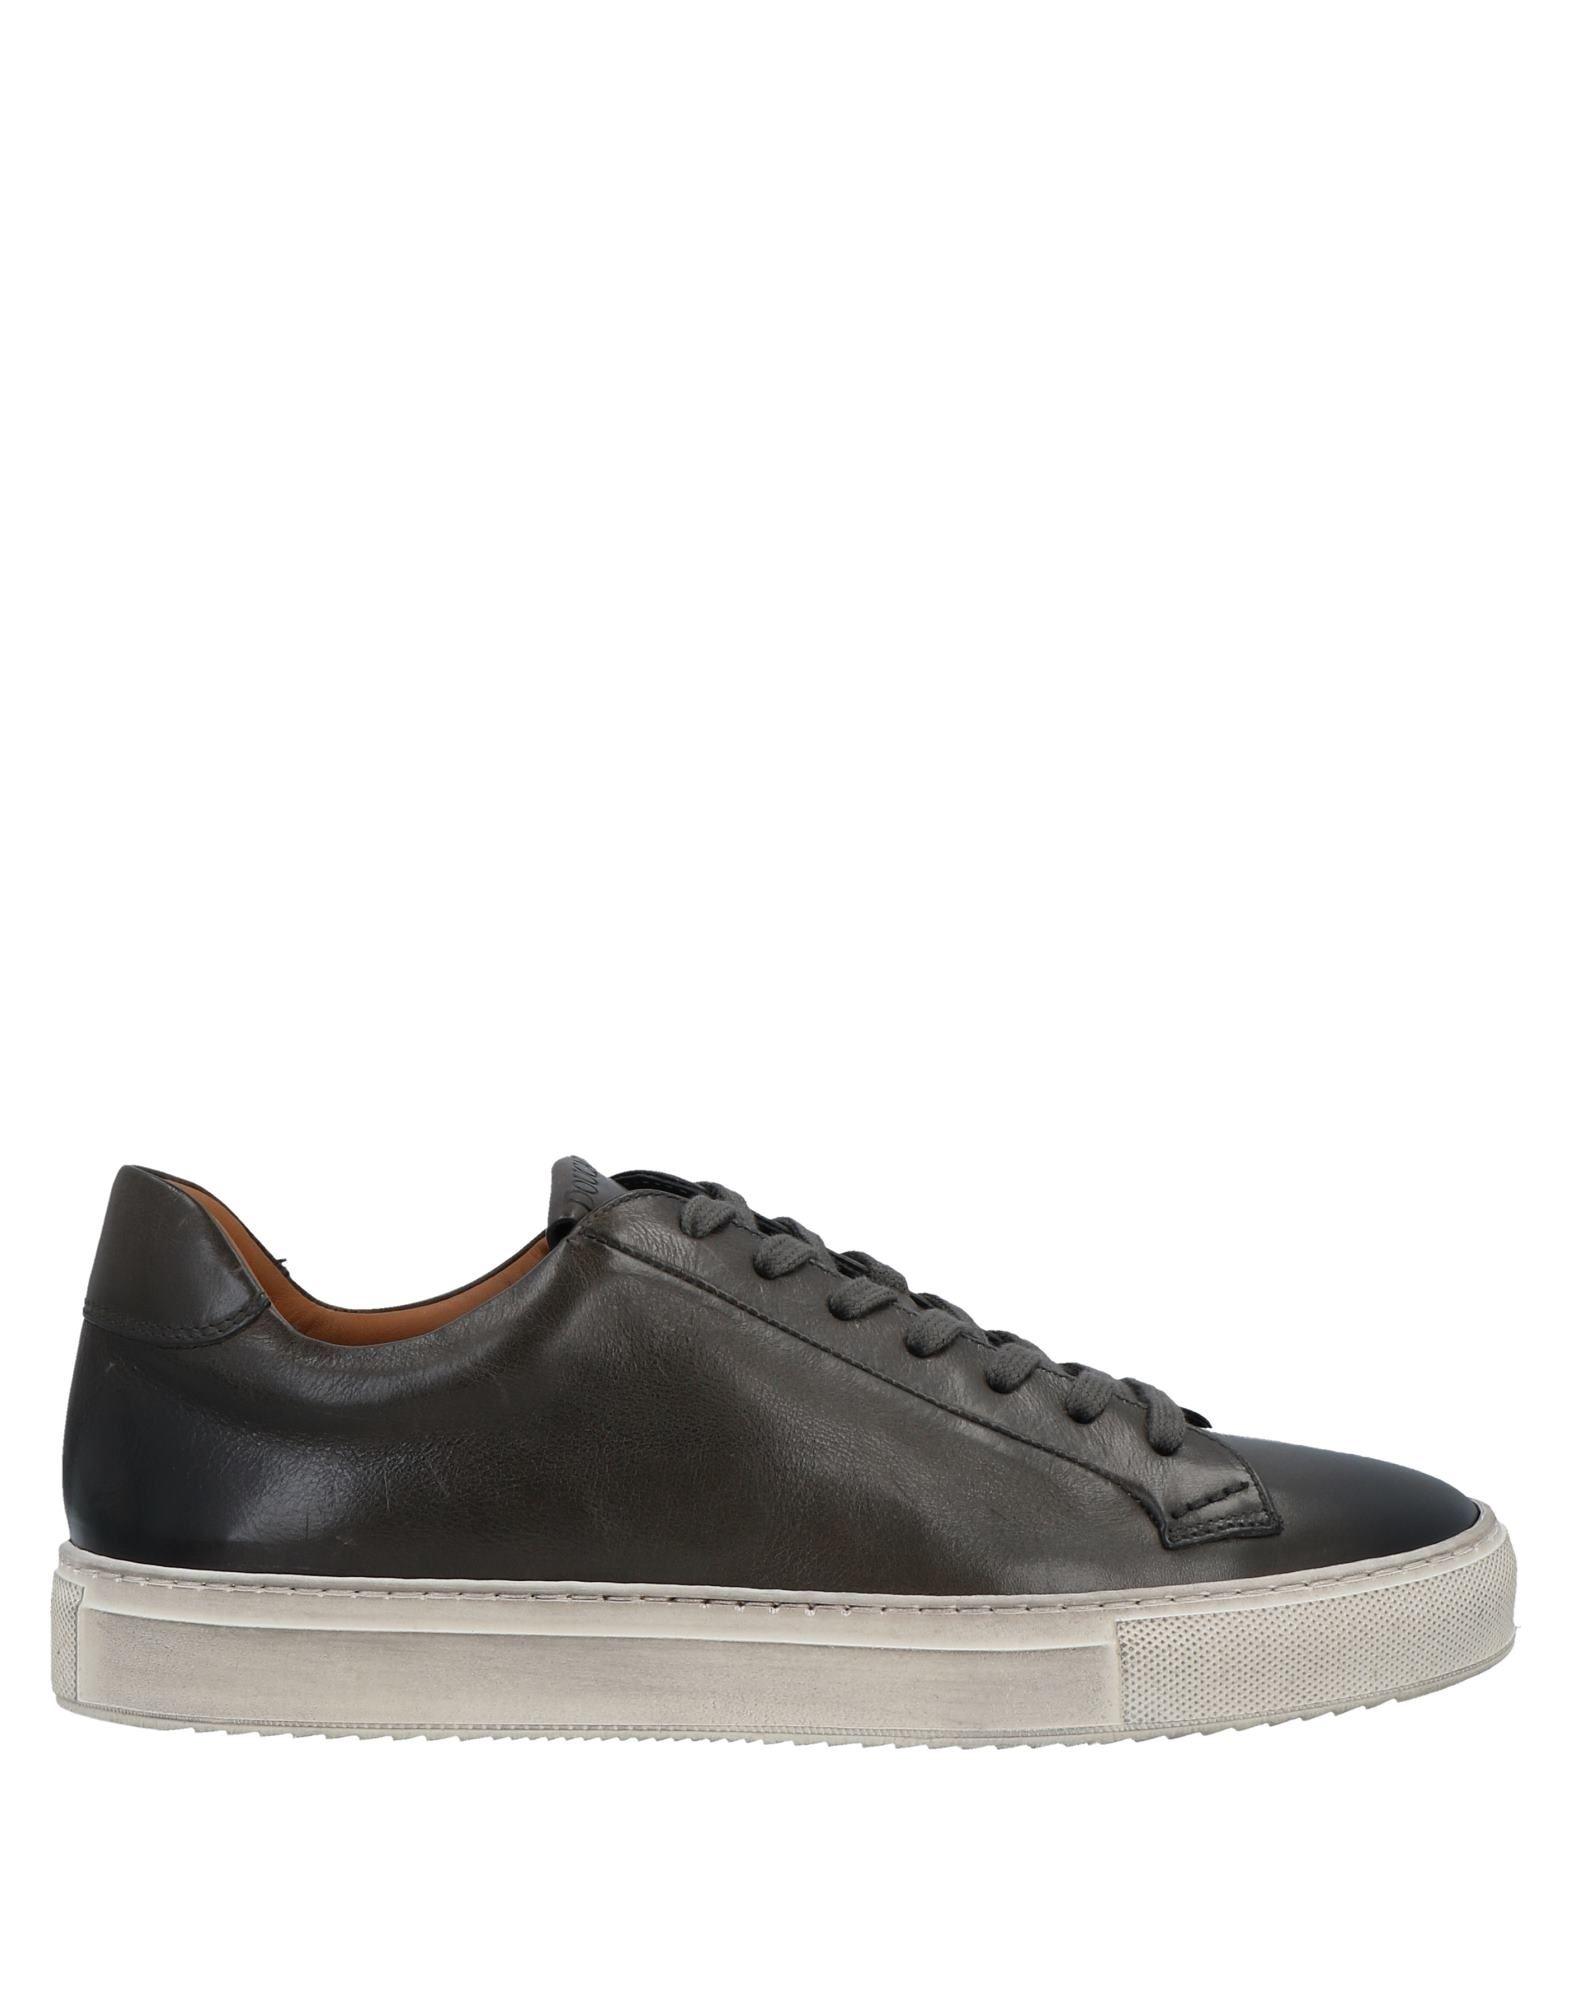 DOUCAL'S Low-tops & sneakers - Item 17022513